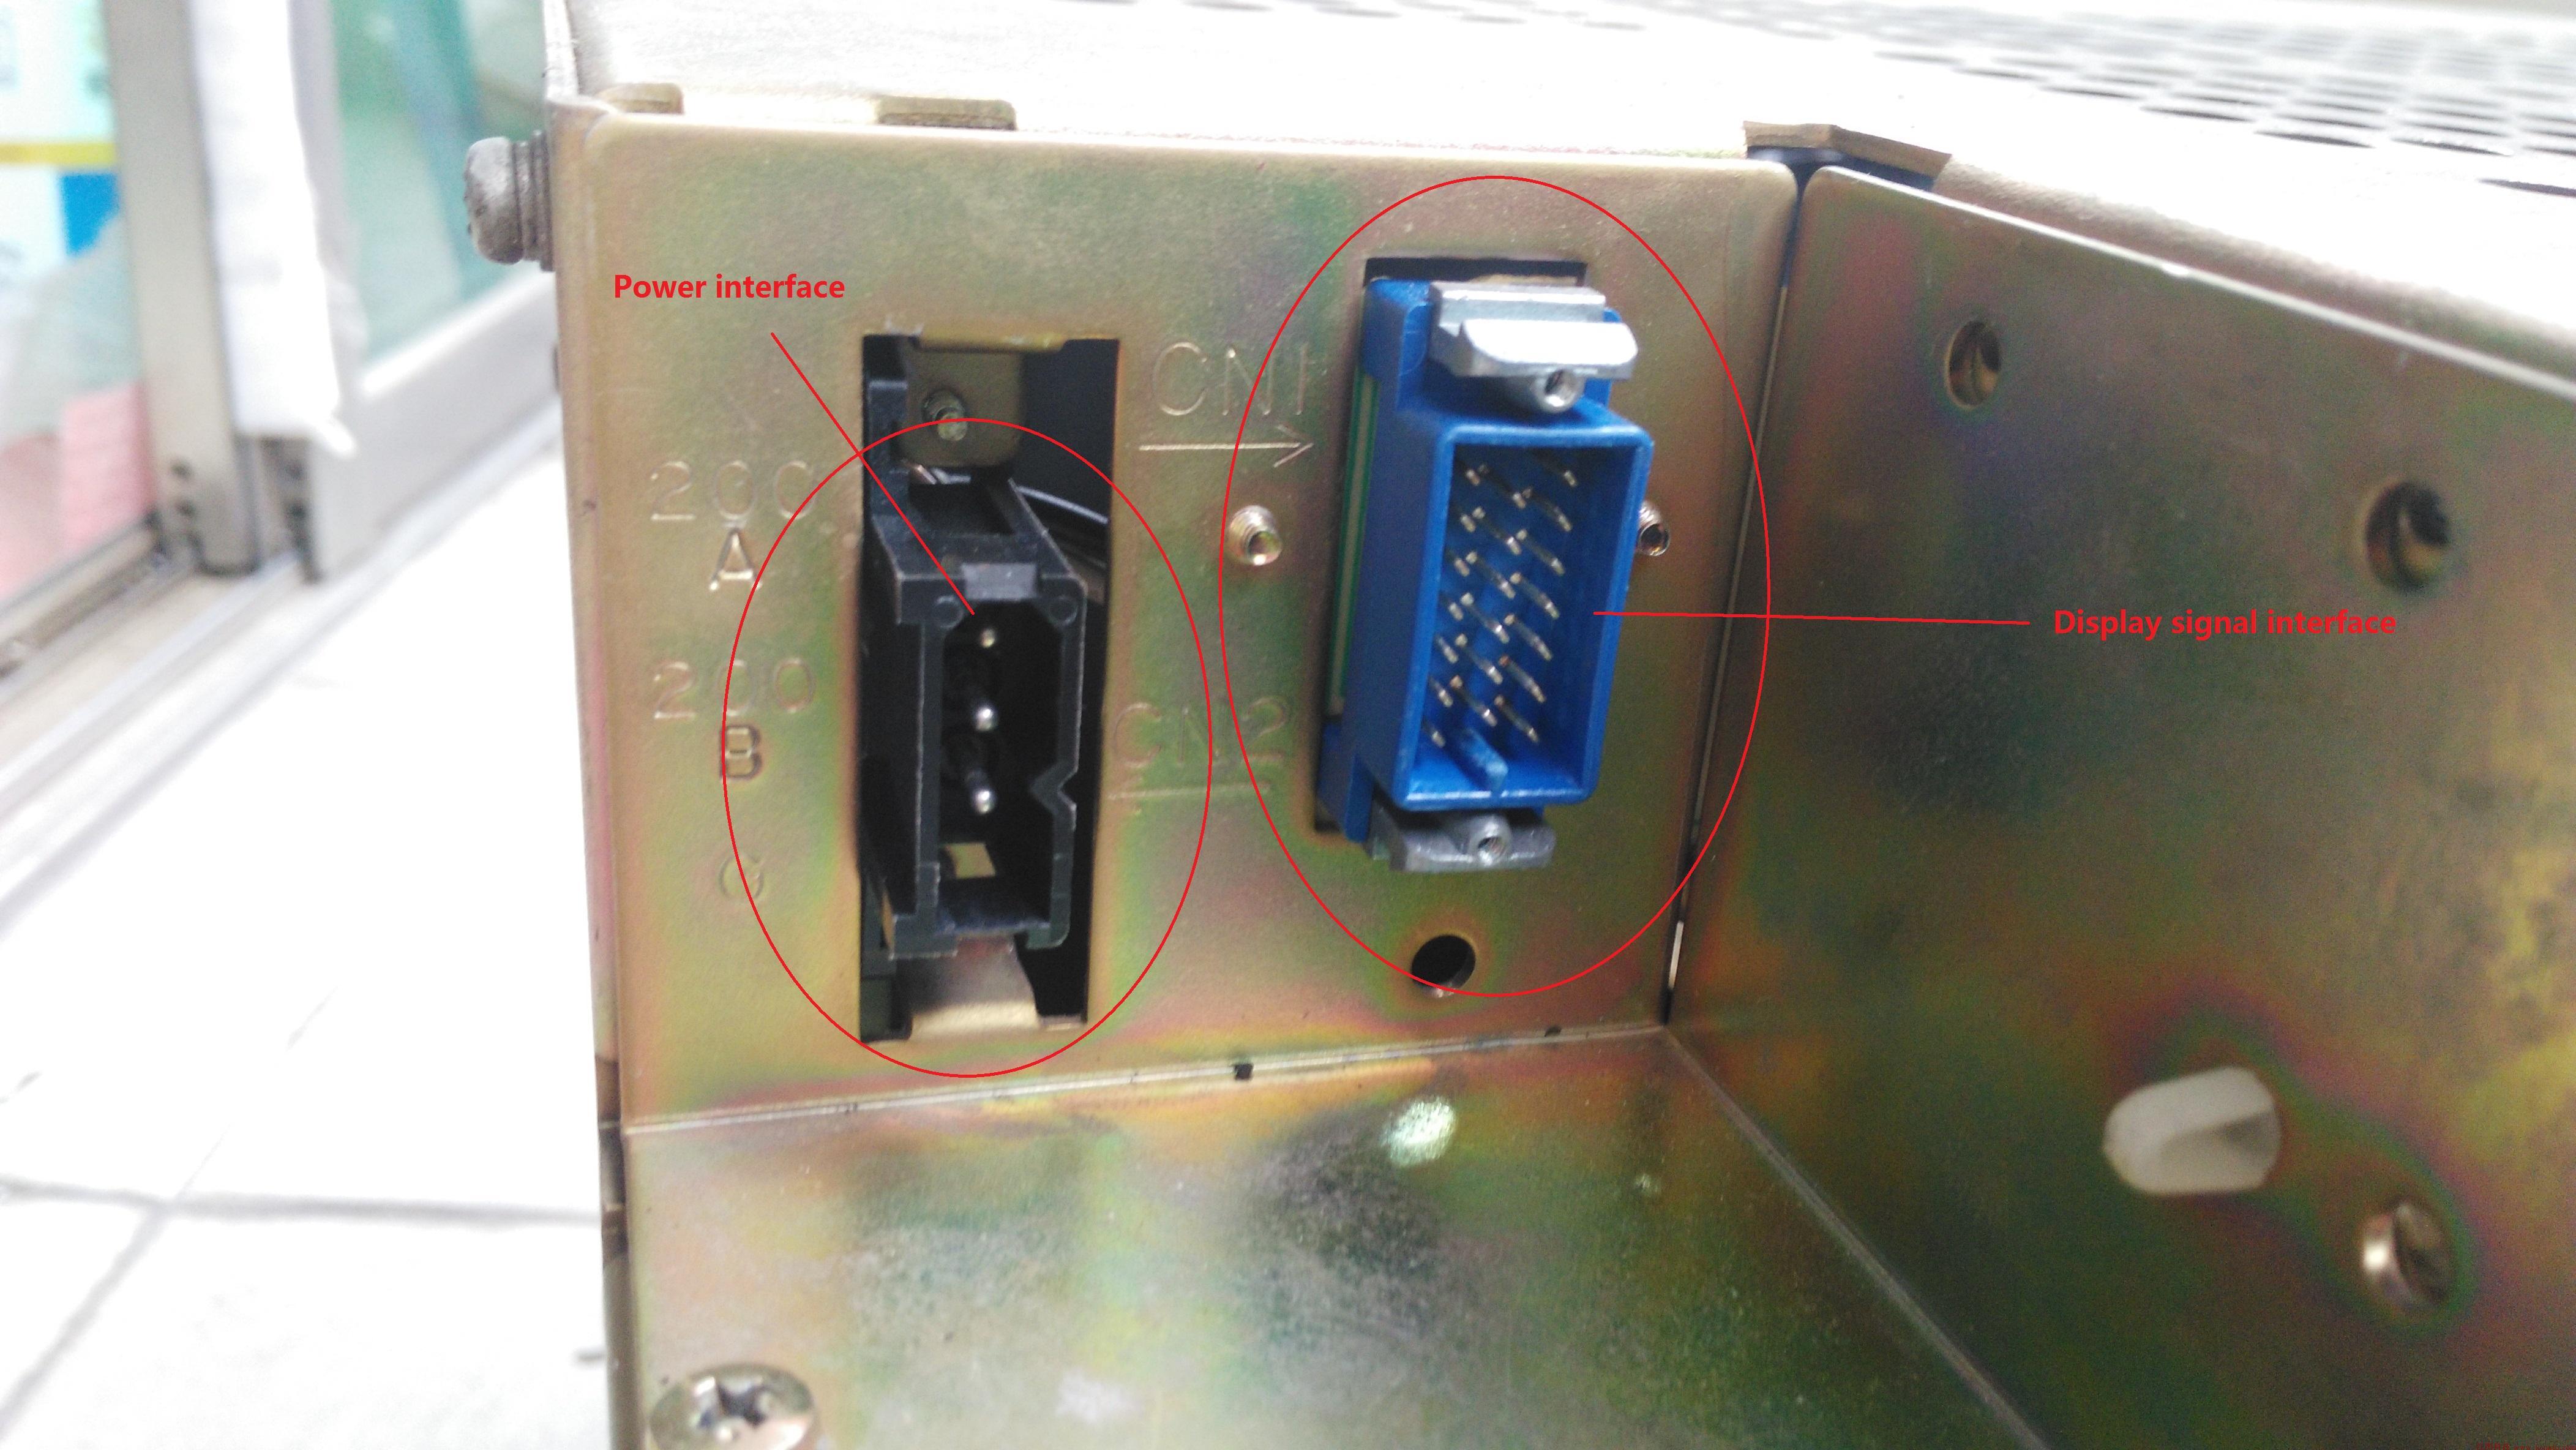 FANUC  A61L-0001-0074 0094 发那科机床数控显示器  全新升级V2.